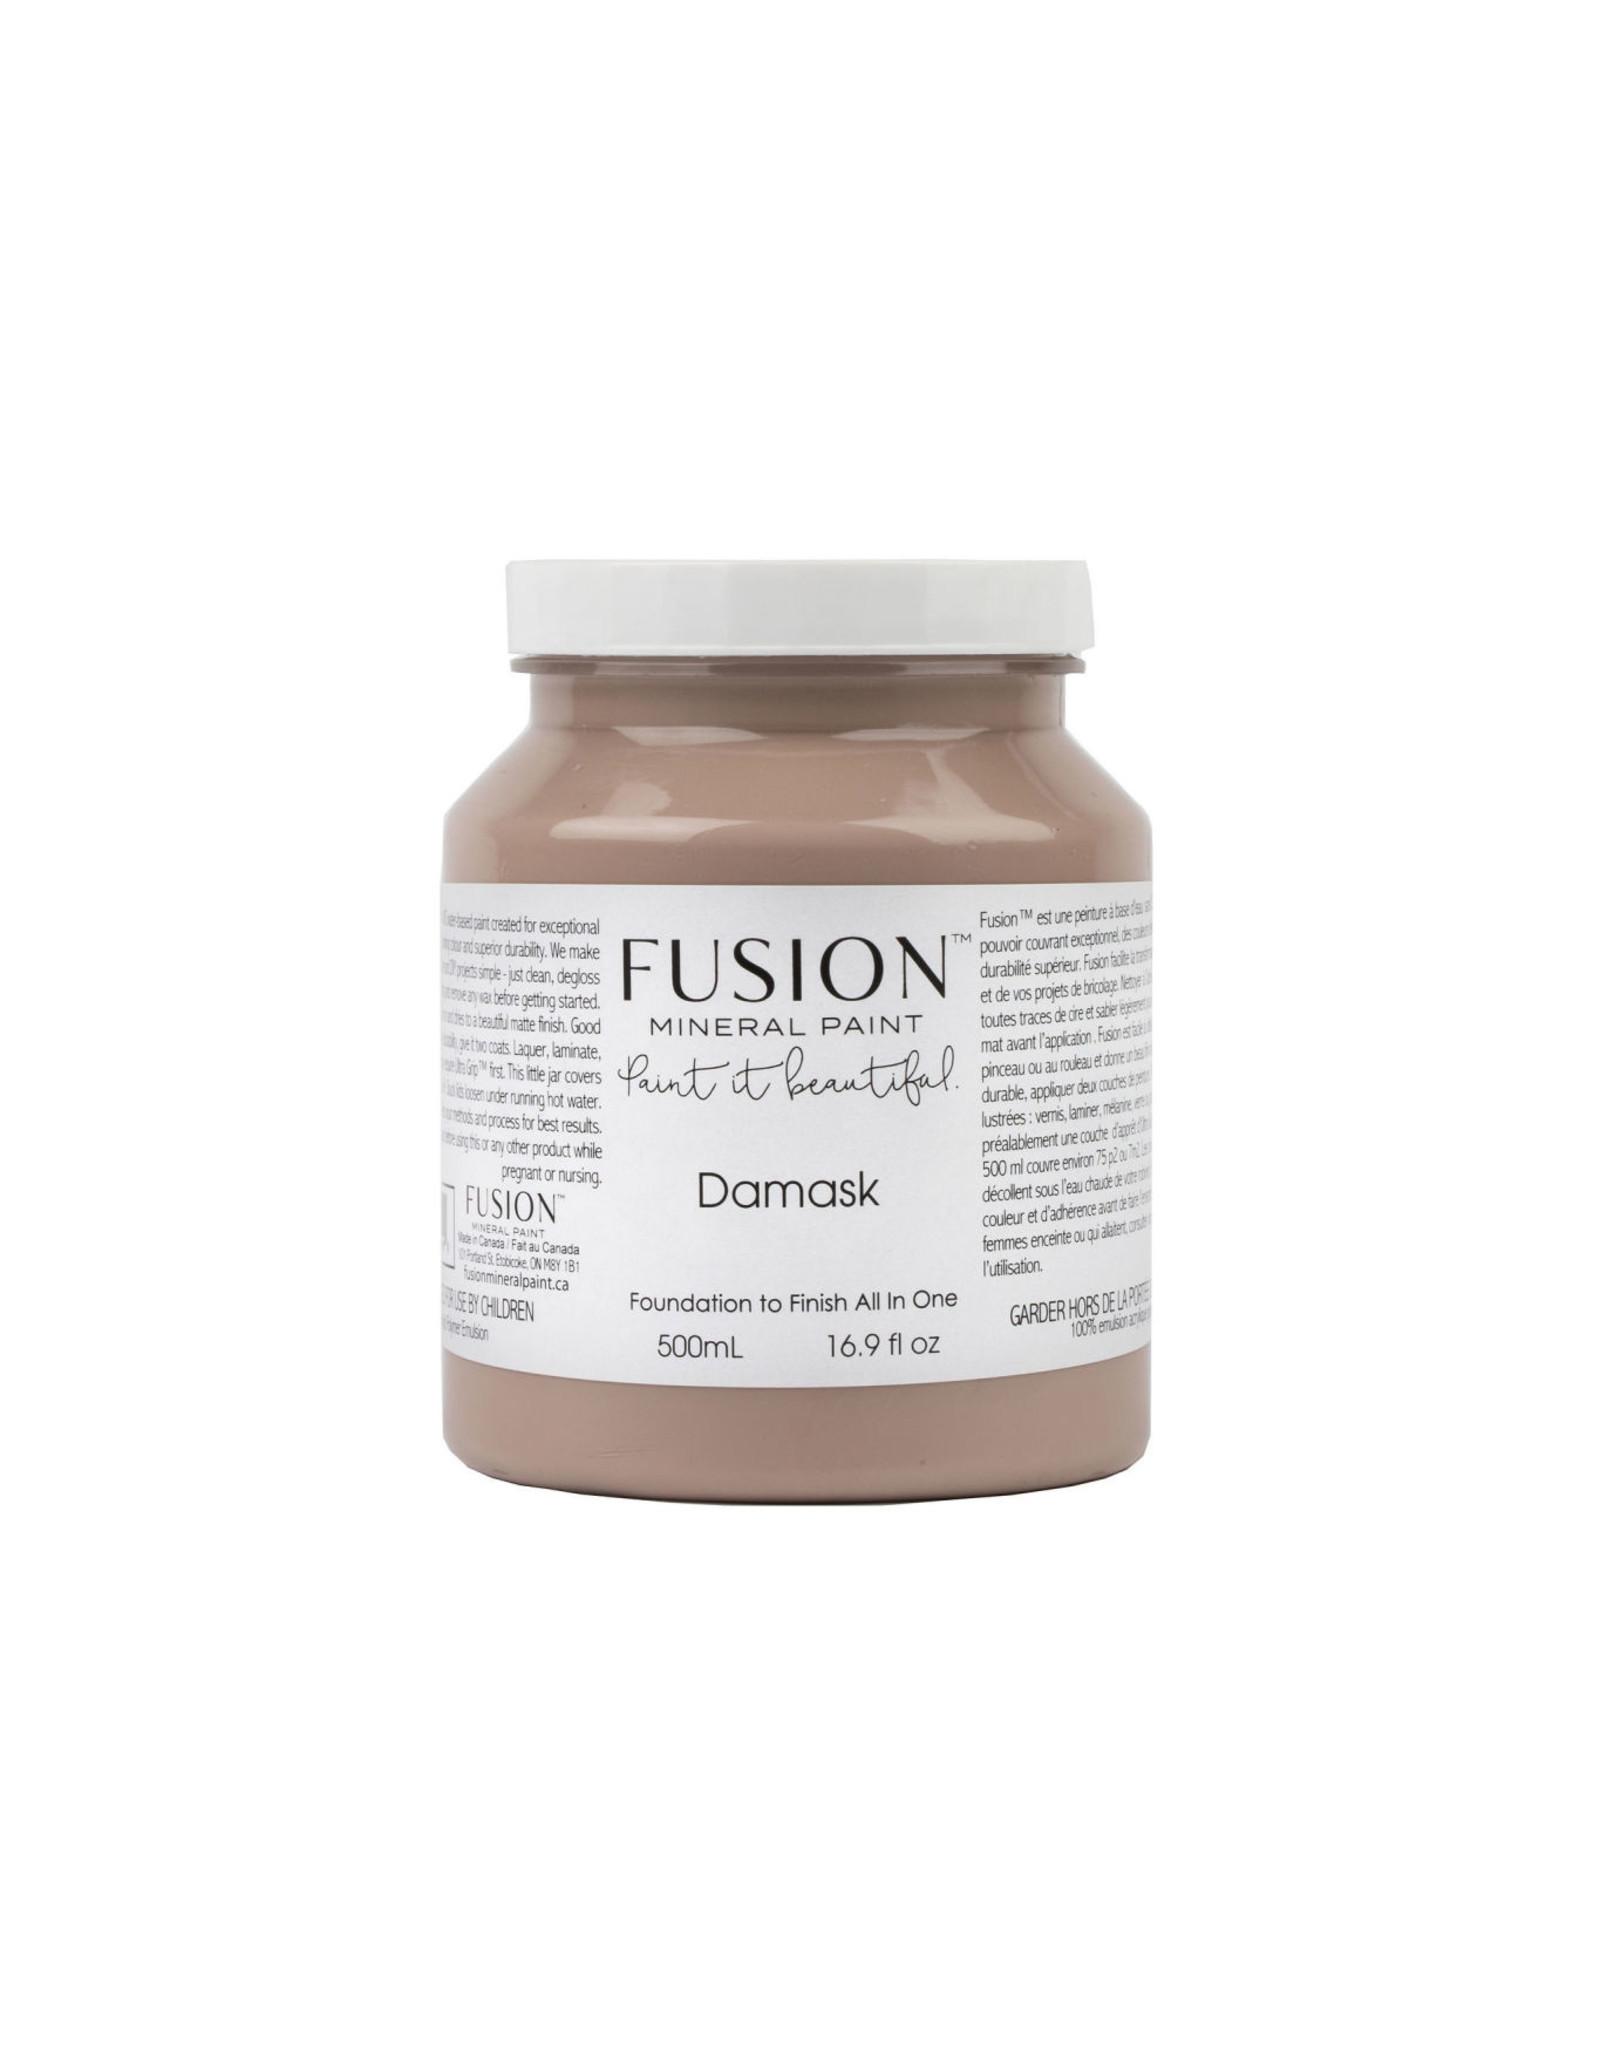 Fusion Mineral Paint Fusion Mineral Paint - Damask 500ml